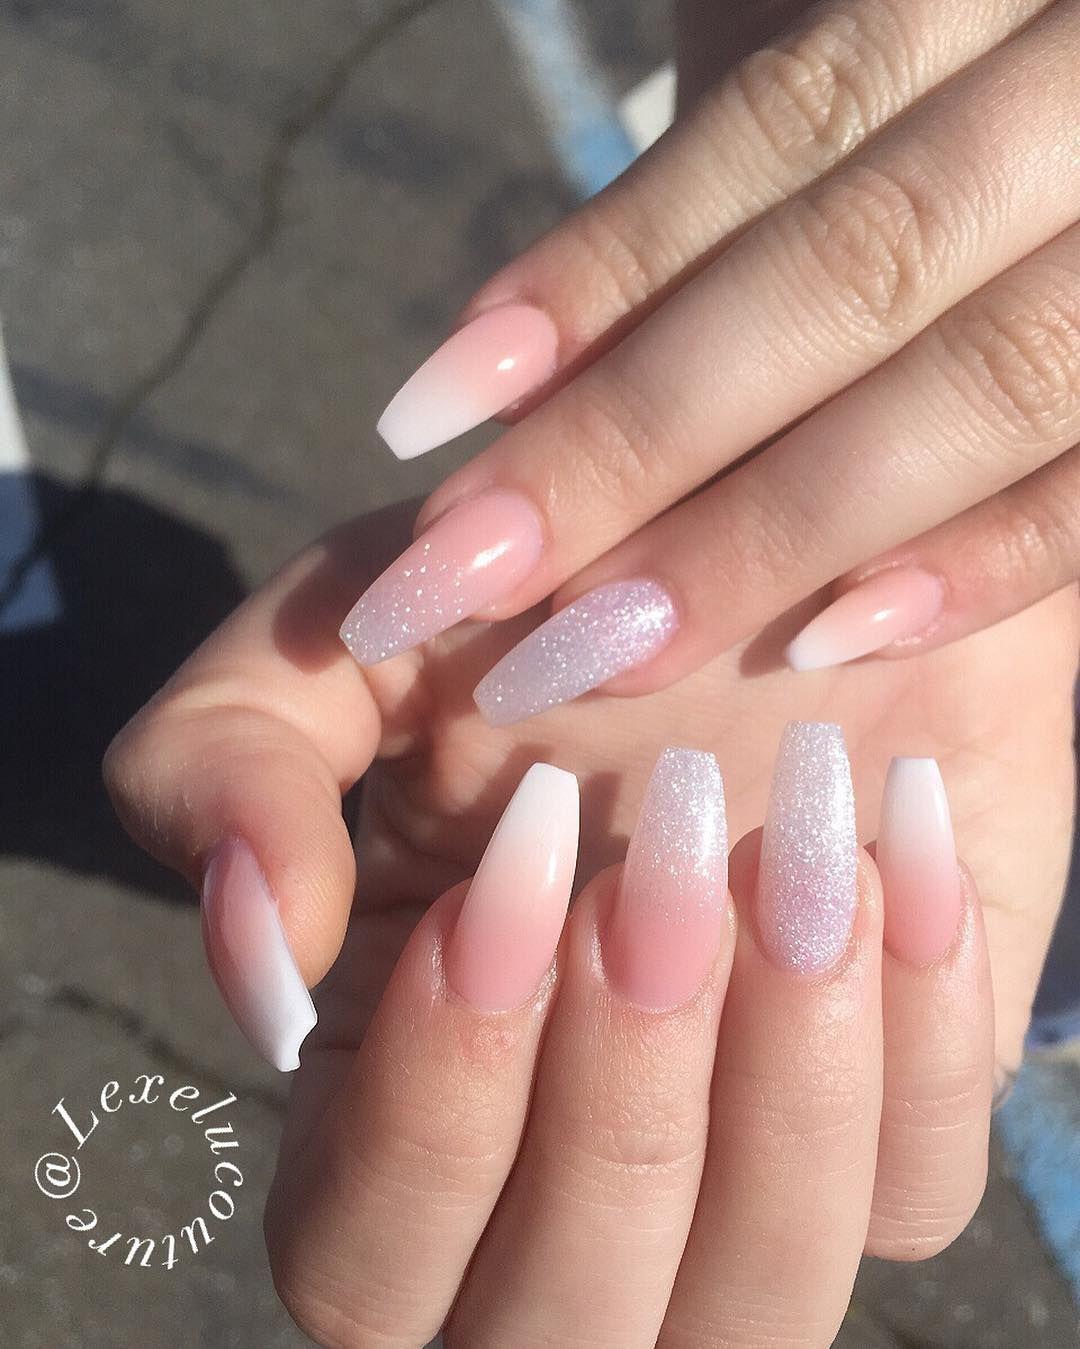 blessedprincesa ♔ | Uñas de porcelana | Pinterest | Diseños de uñas ...